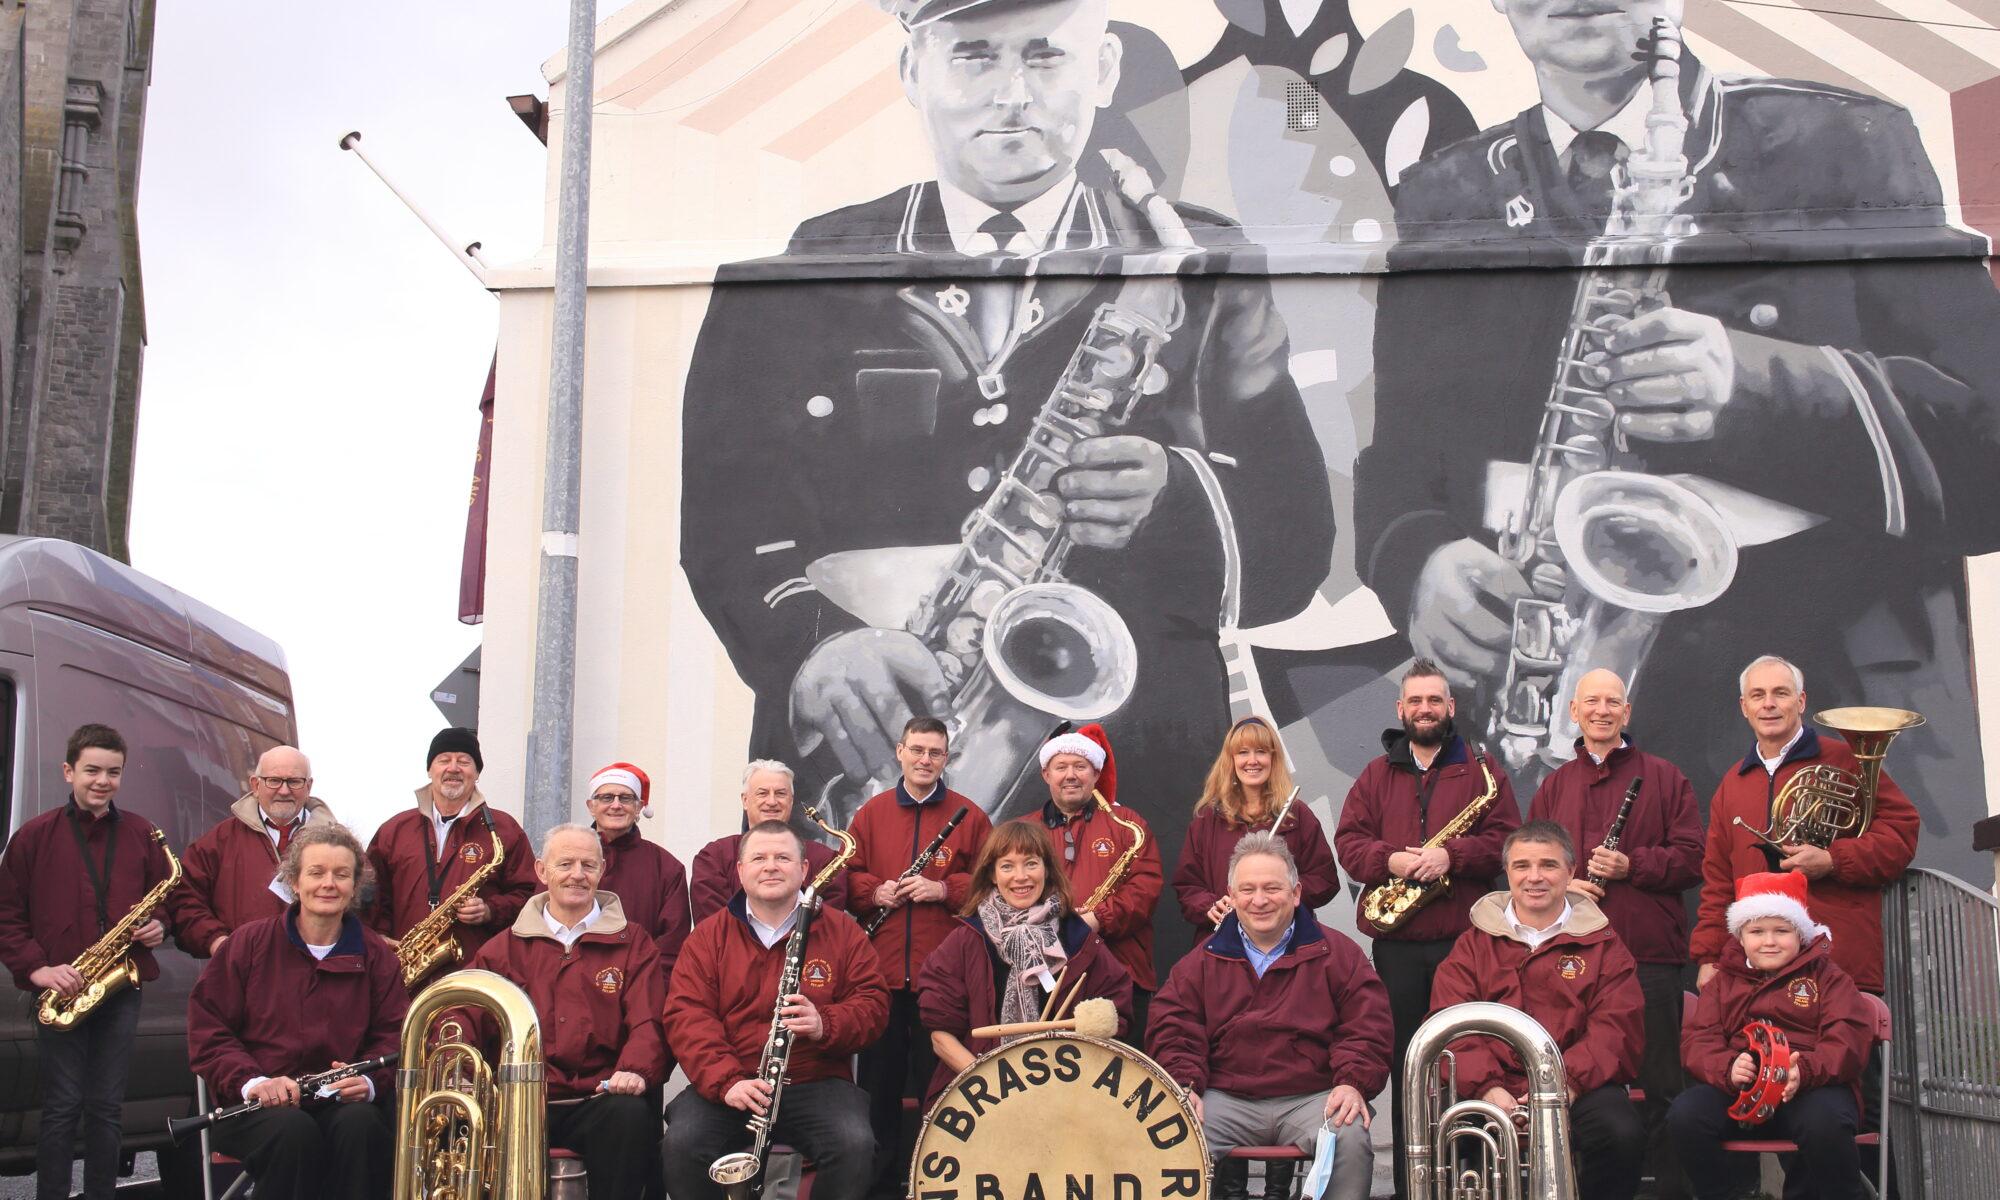 St. John's Band Limerick